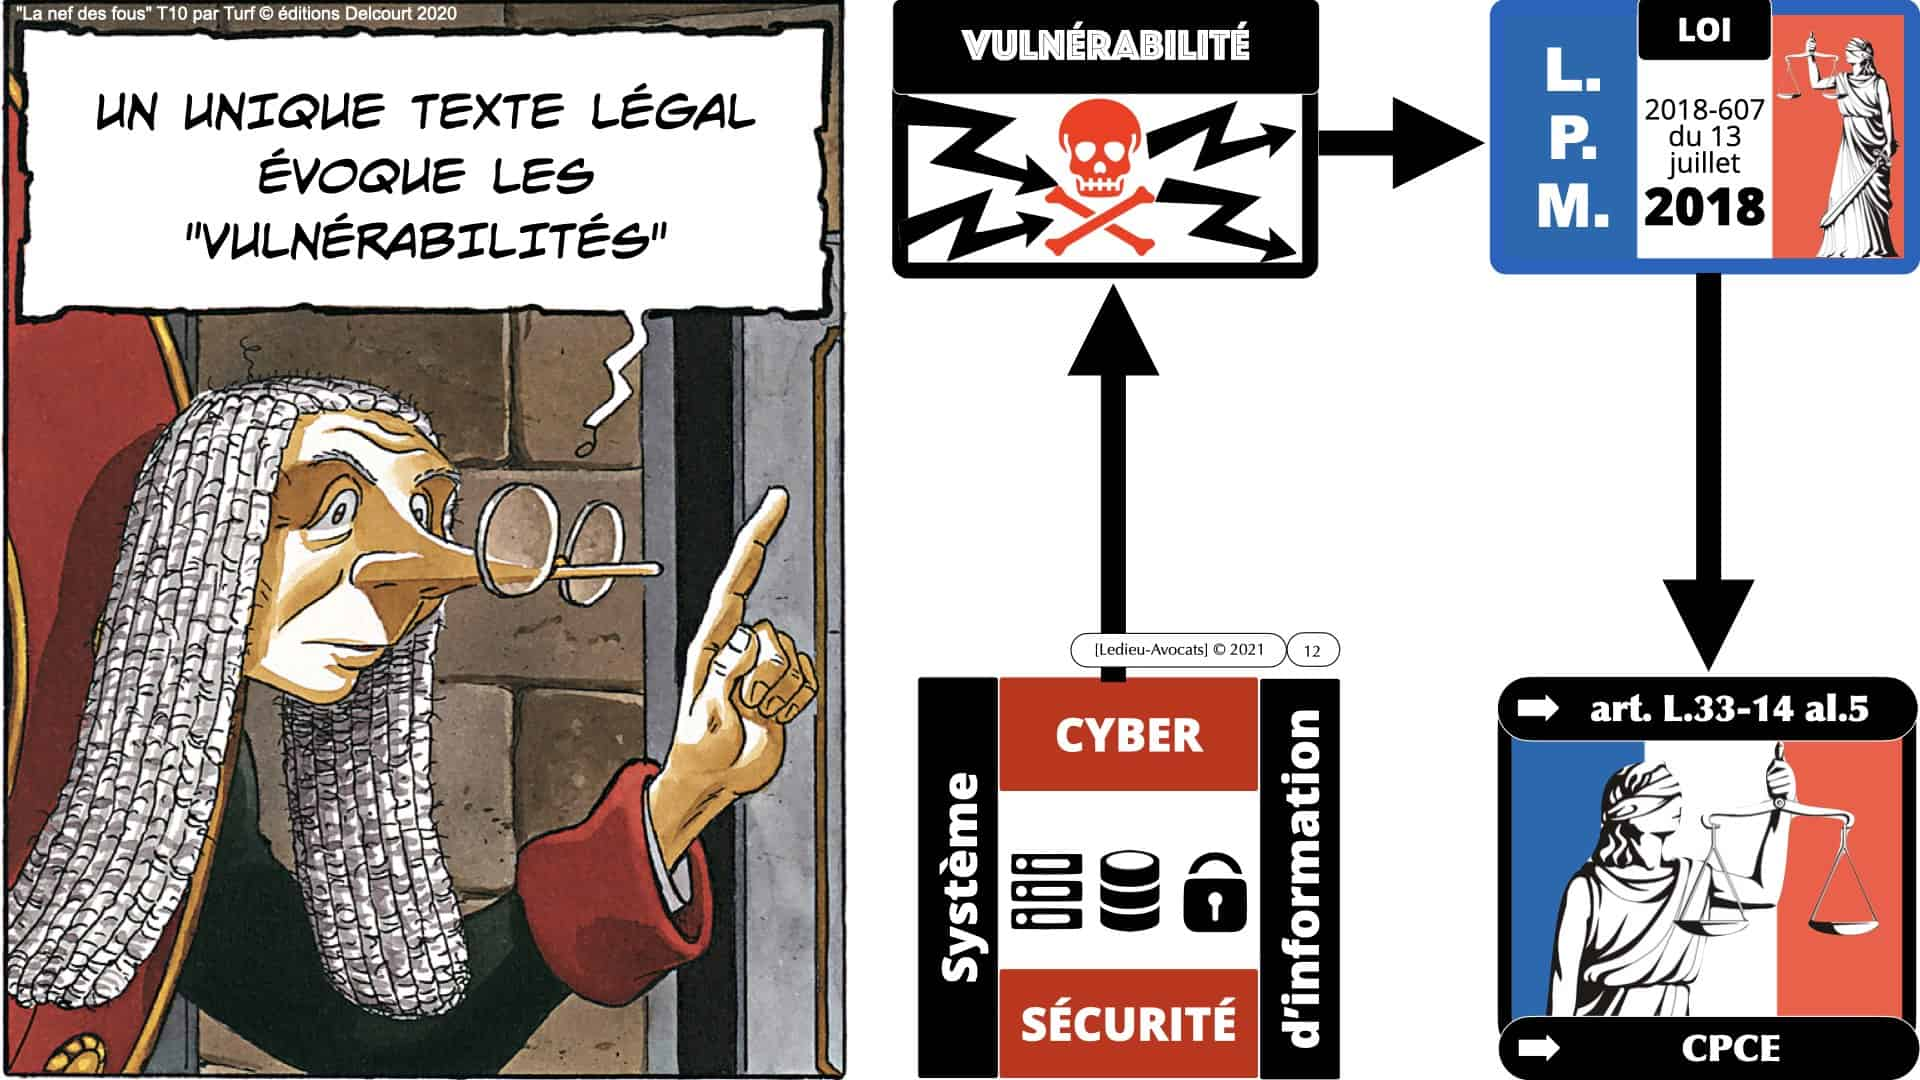 malware et vulnérabilités dans les contrats BtoB en 2021